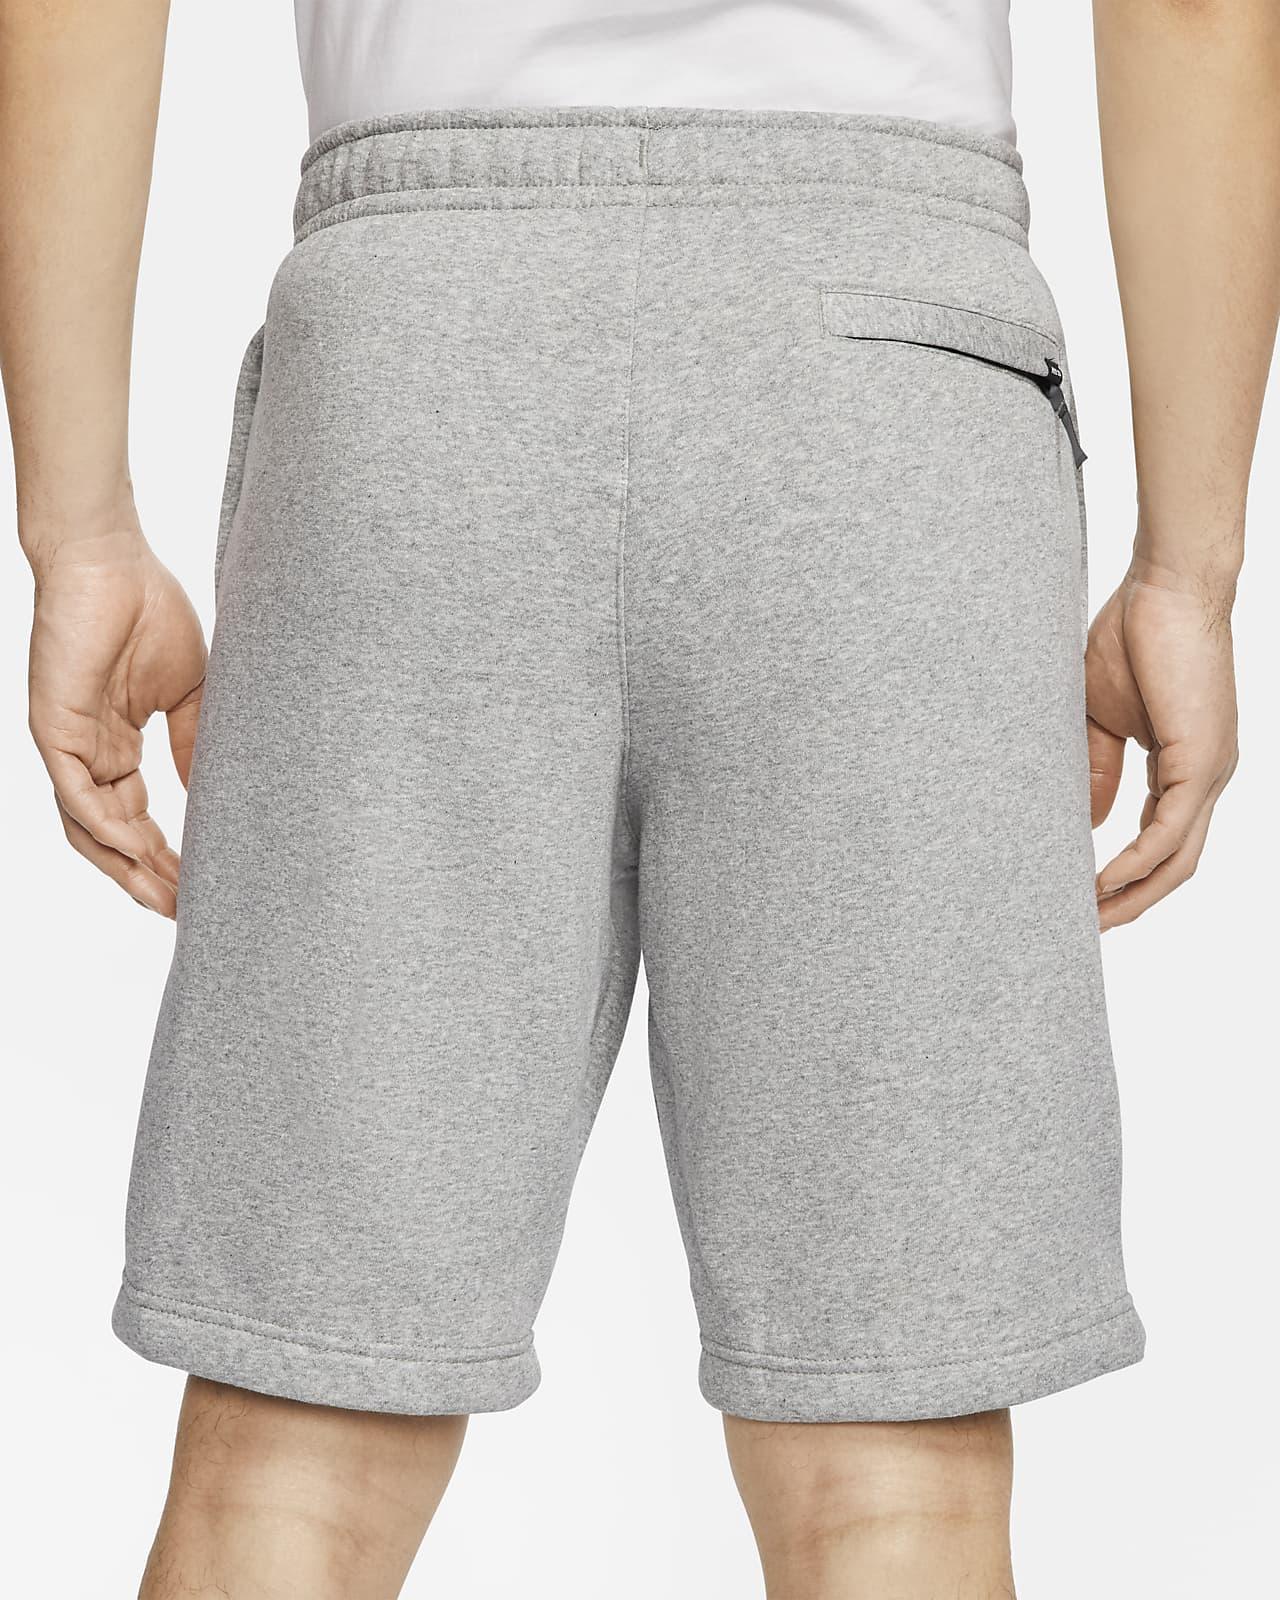 Nike SB Icon Men's Fleece Skate Shorts